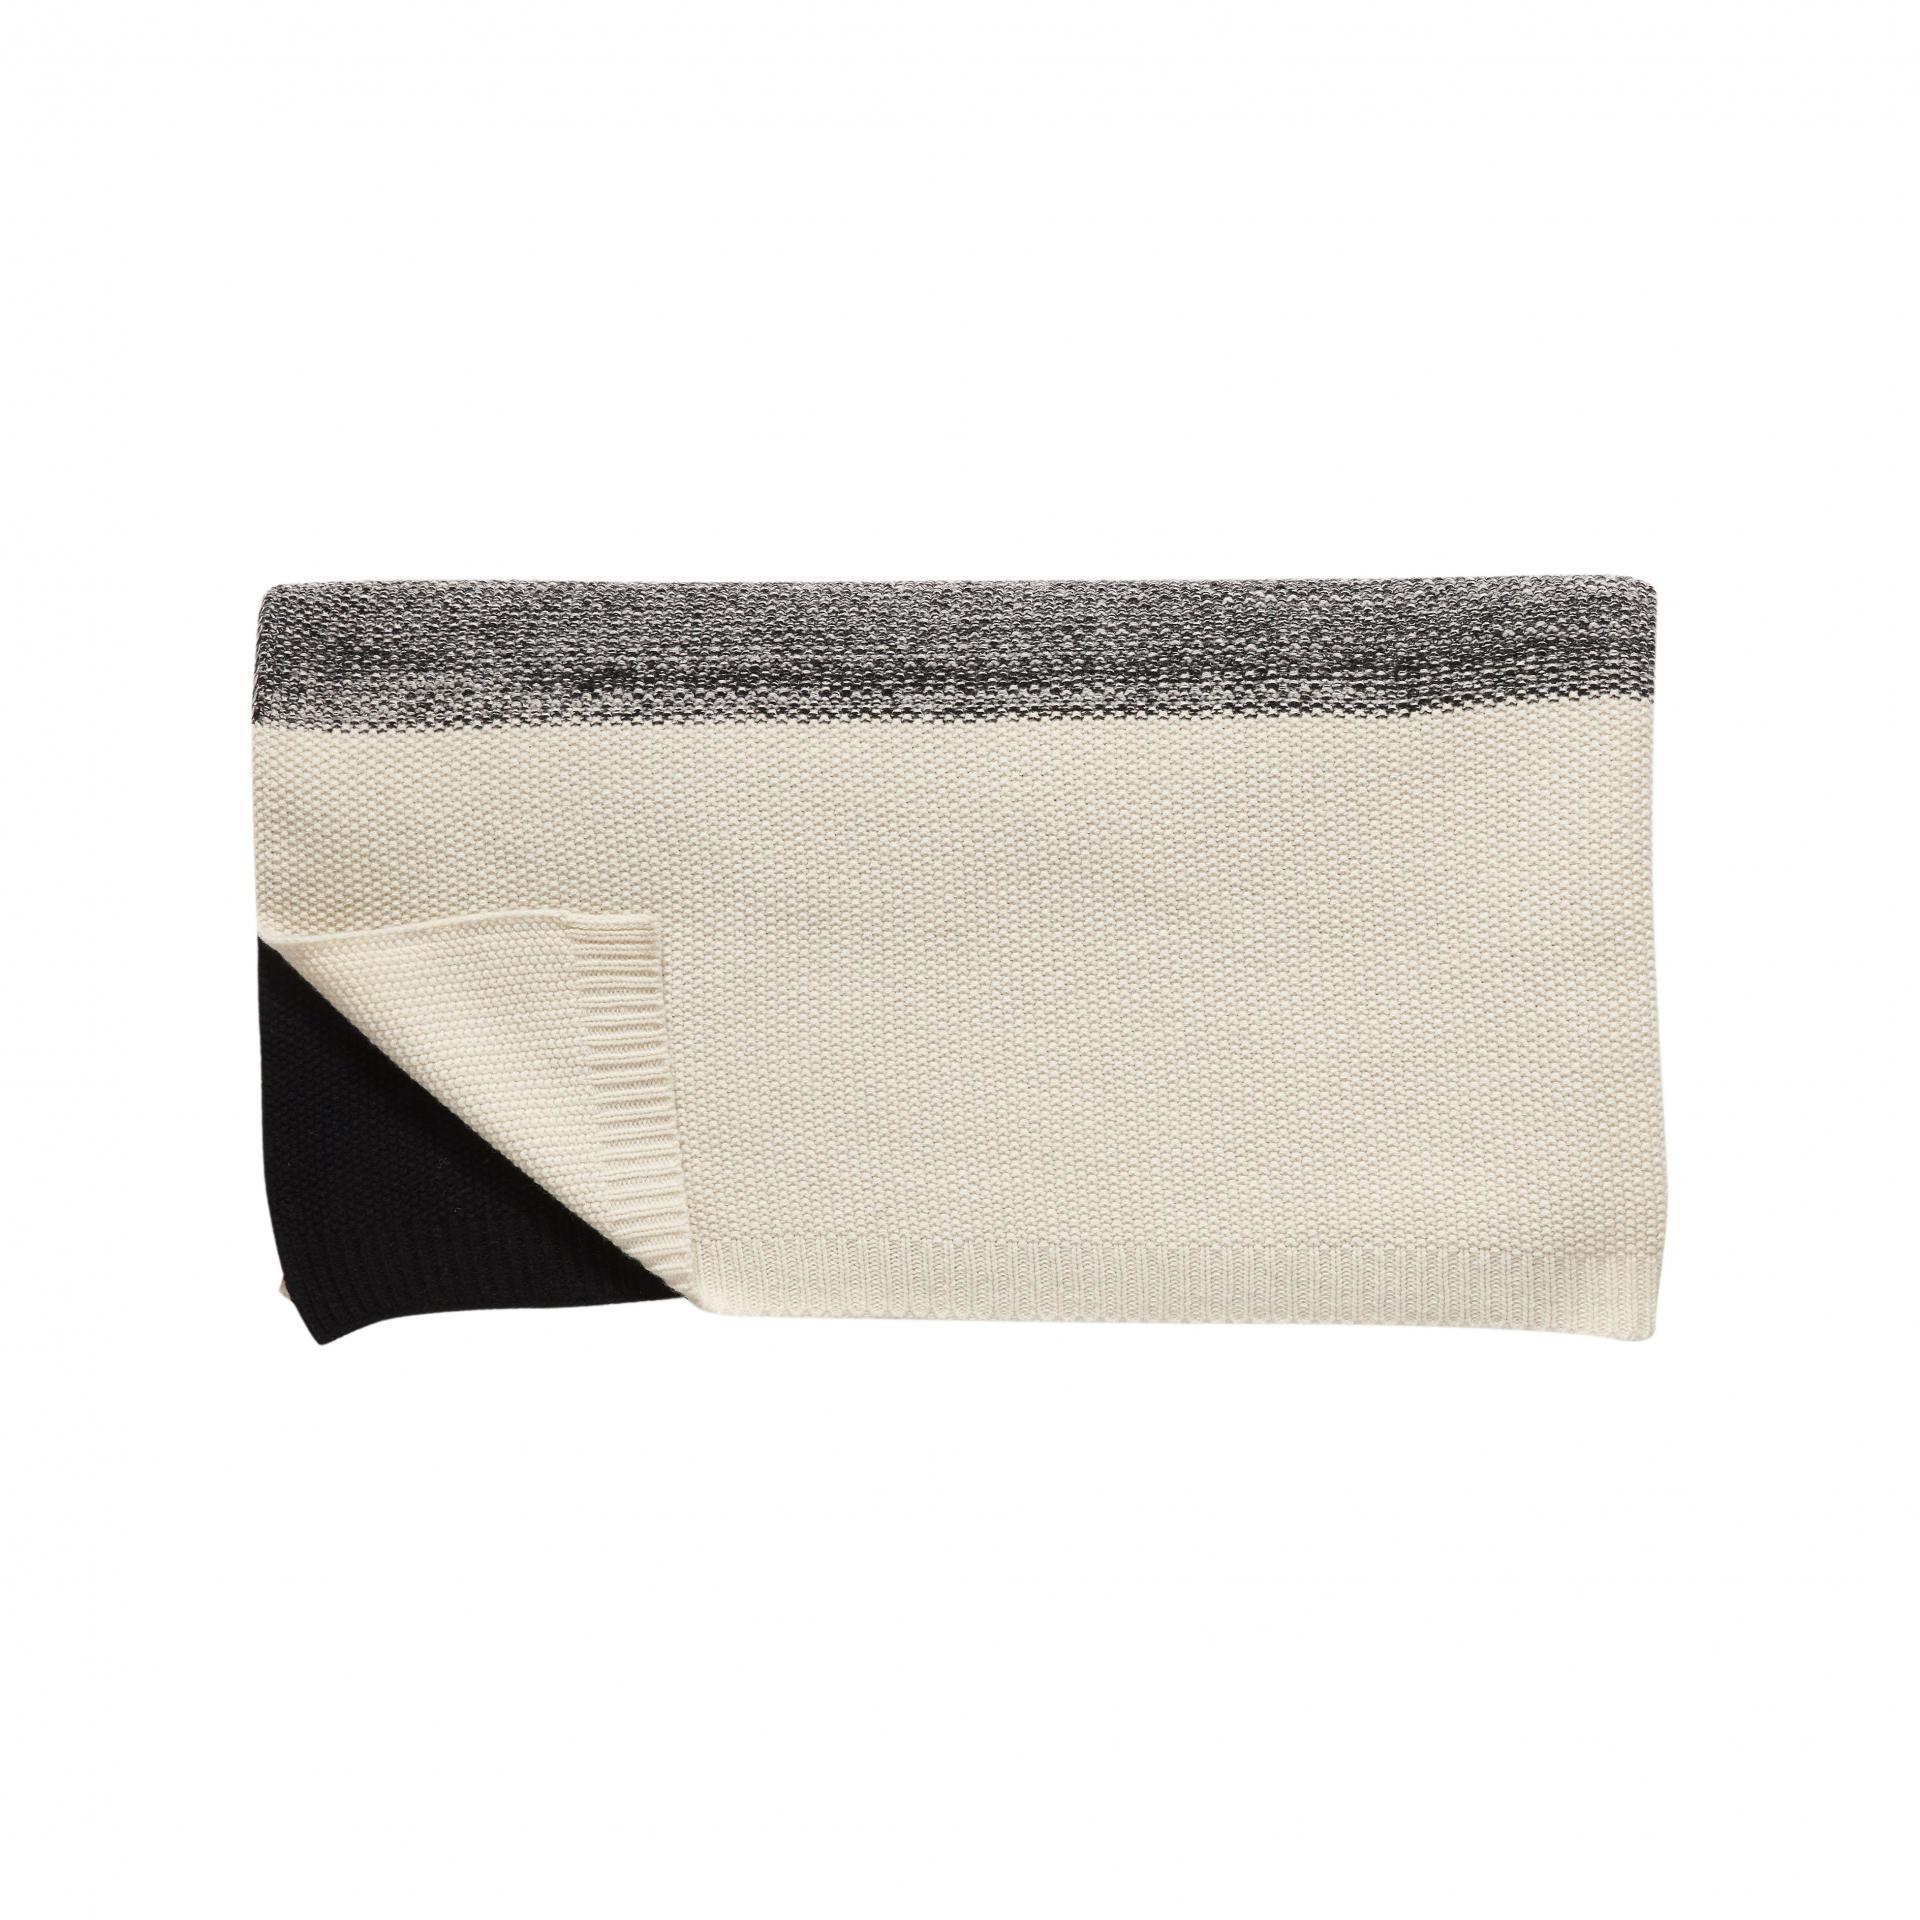 Hübsch Pletený pléd s ovčí vlnou Black/nature 130x200, béžová barva, šedá barva, černá barva, textil